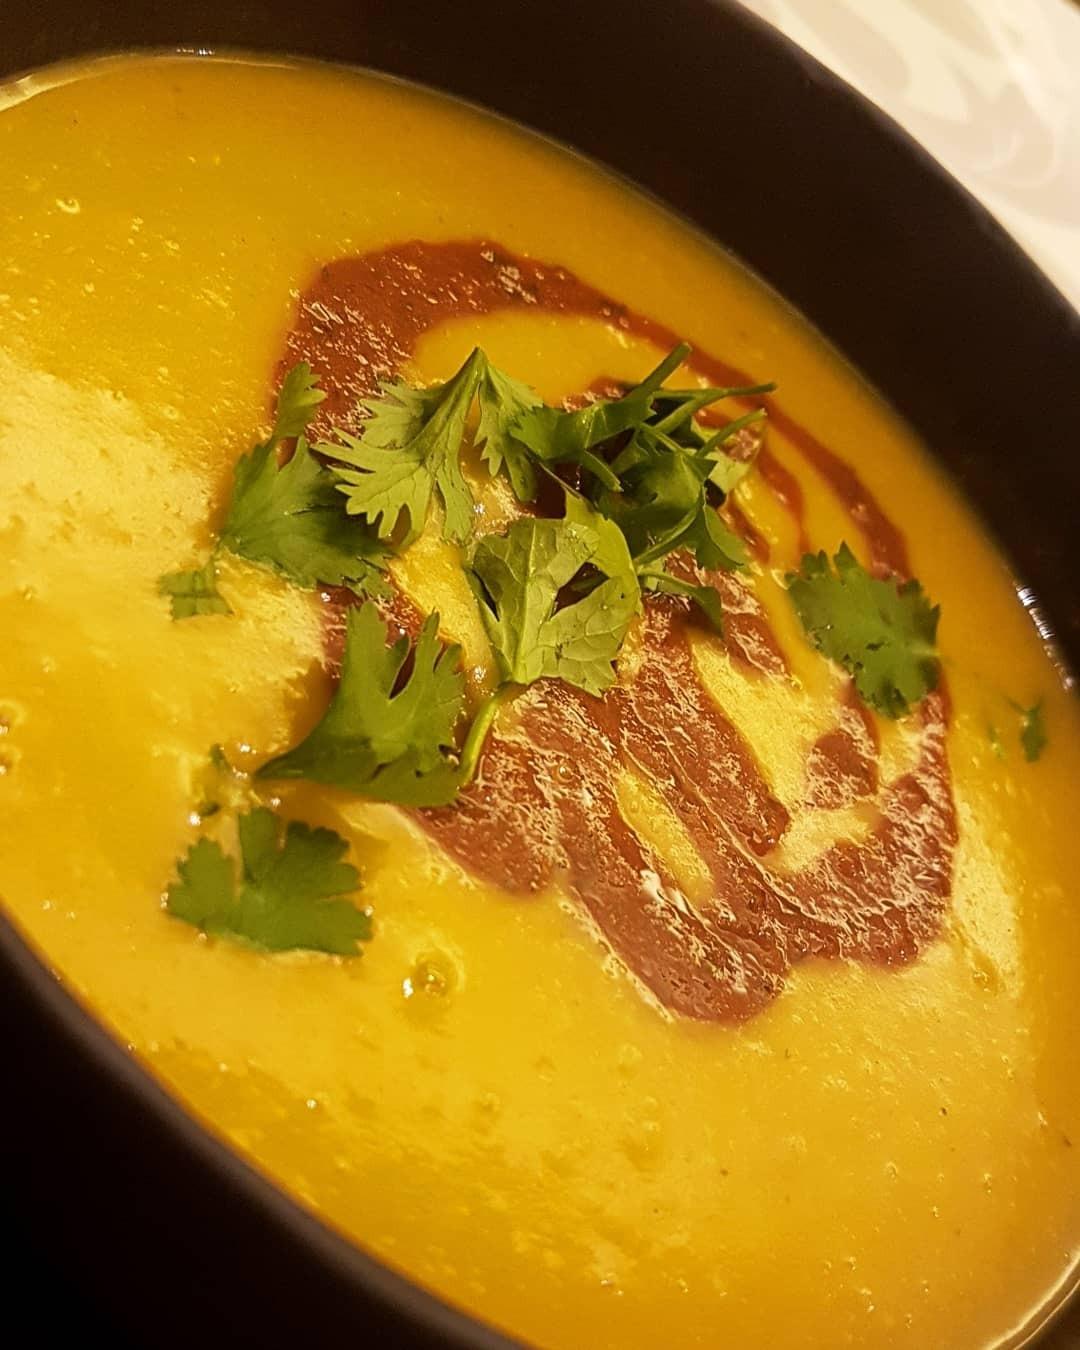 Lentil soup @ نينو - البحرين